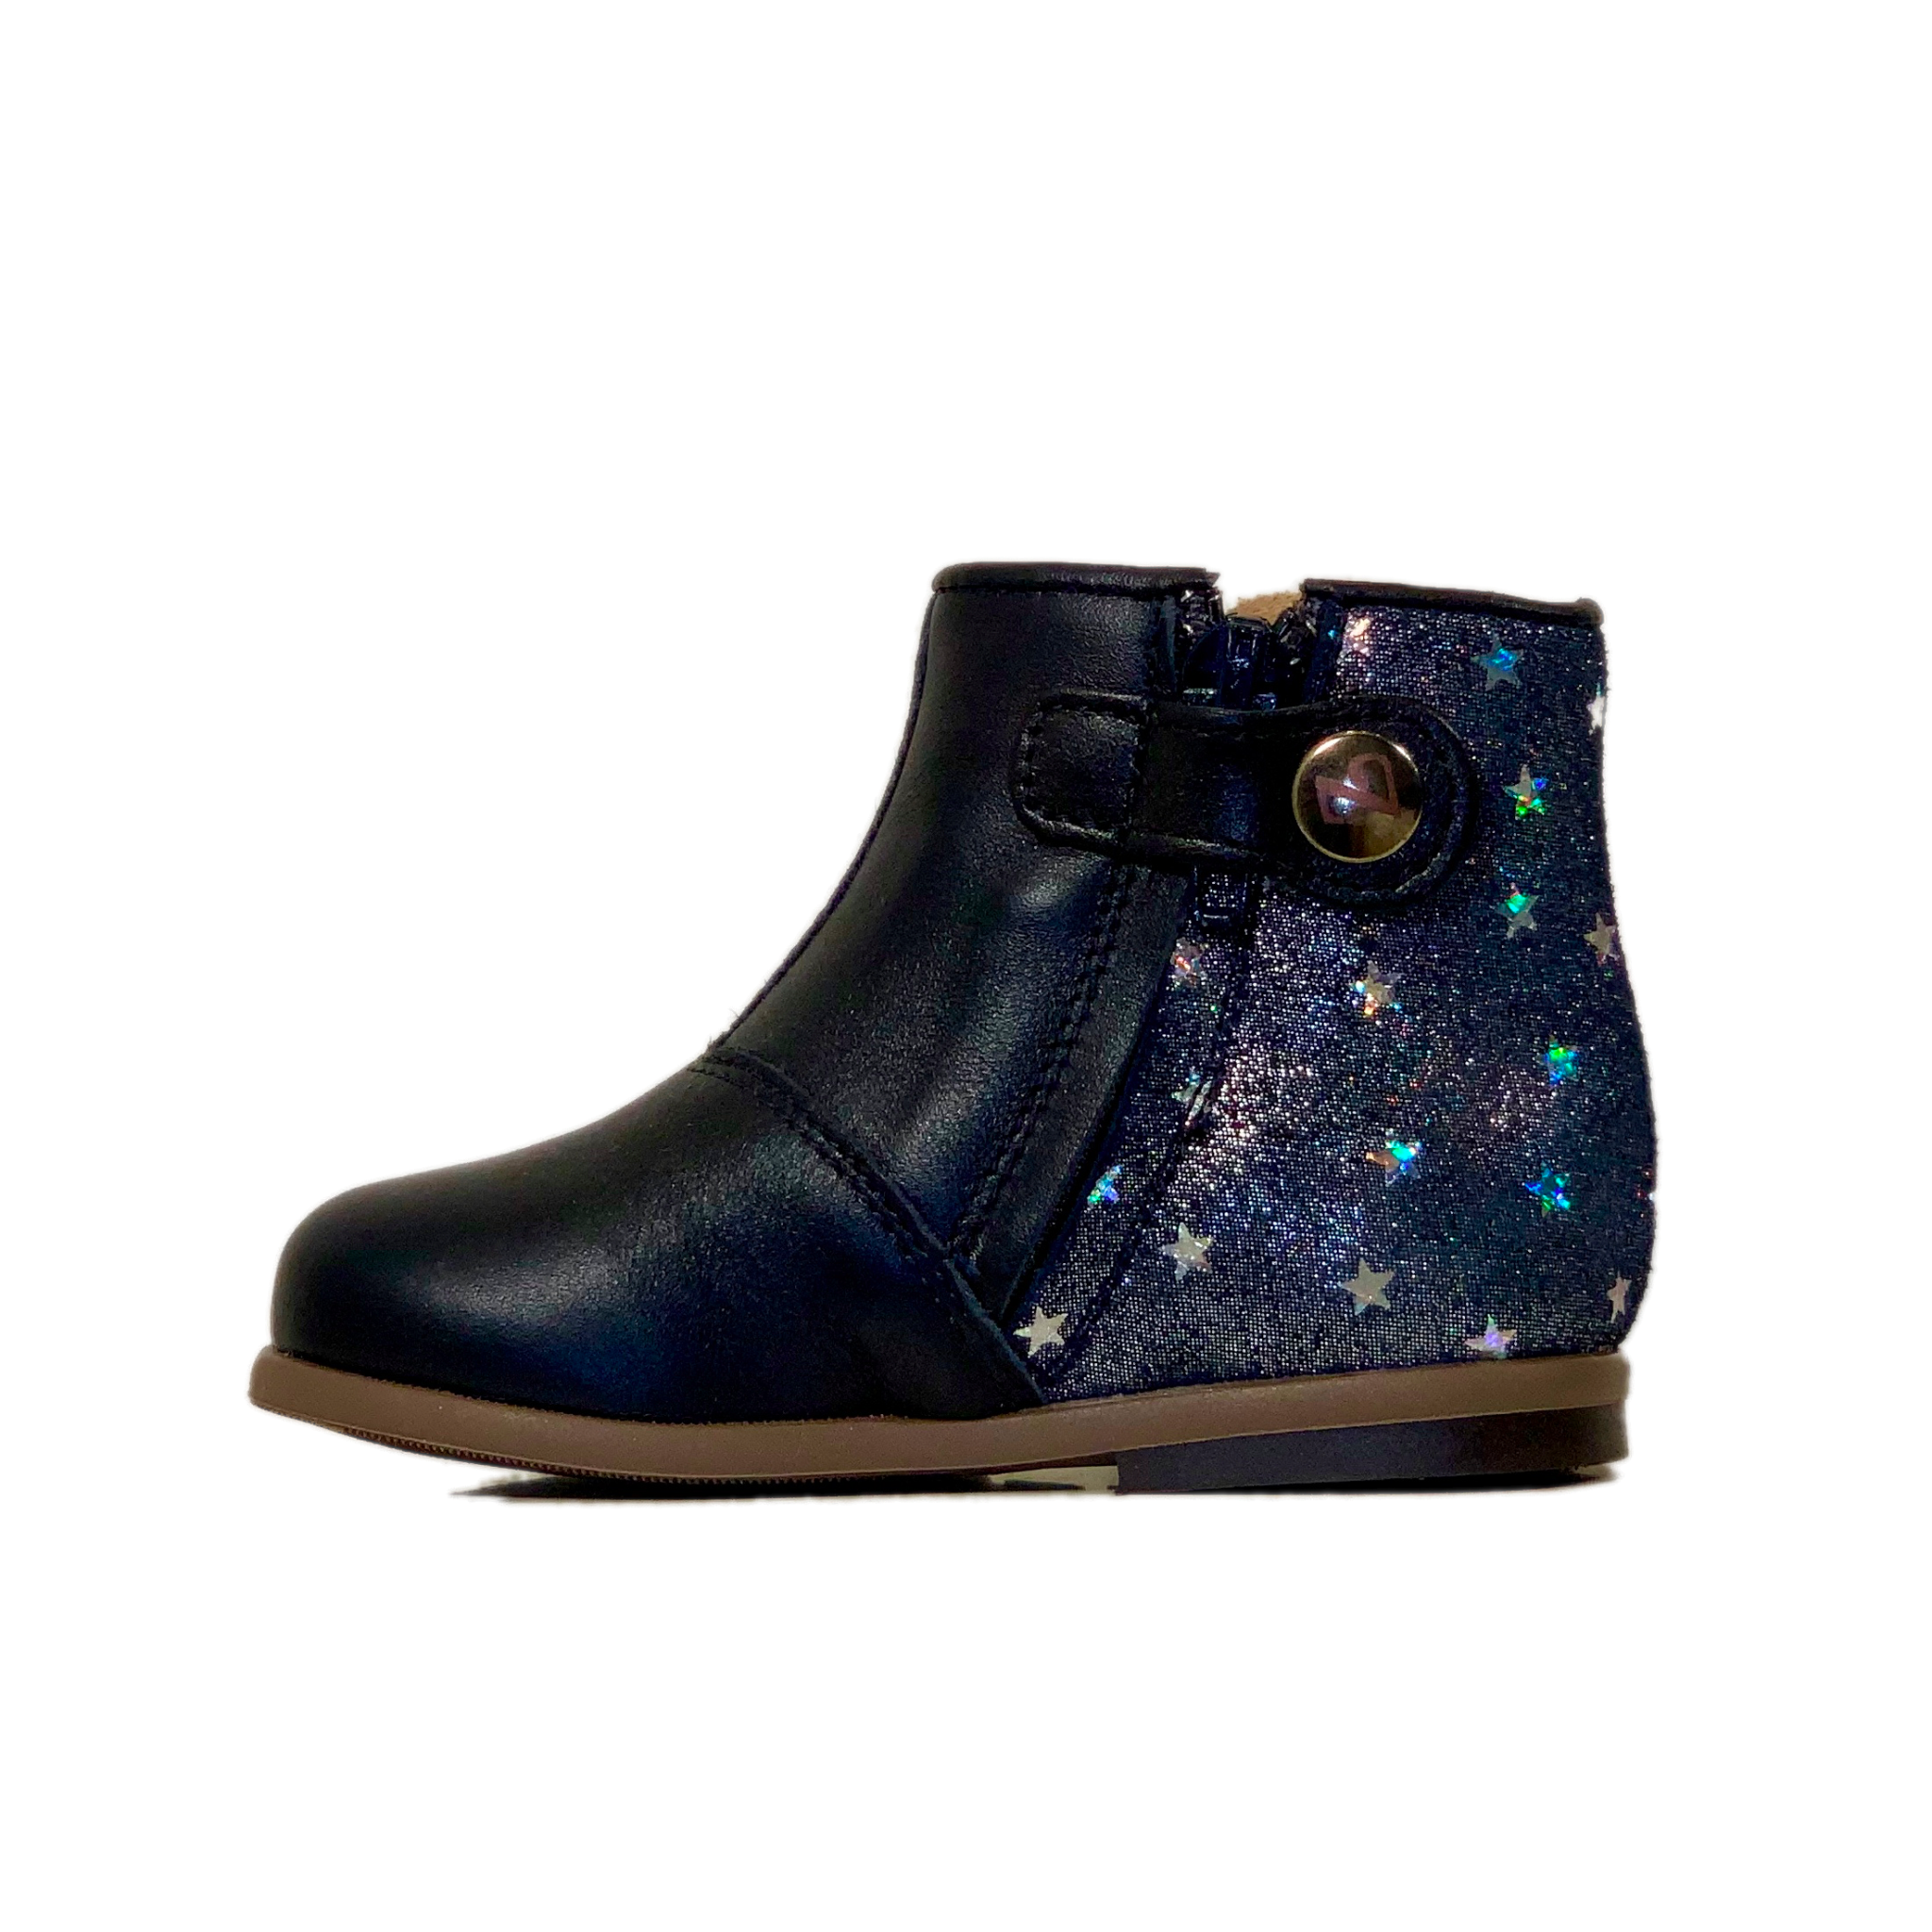 Zecchino d'oro N1-1015 oxigen stars